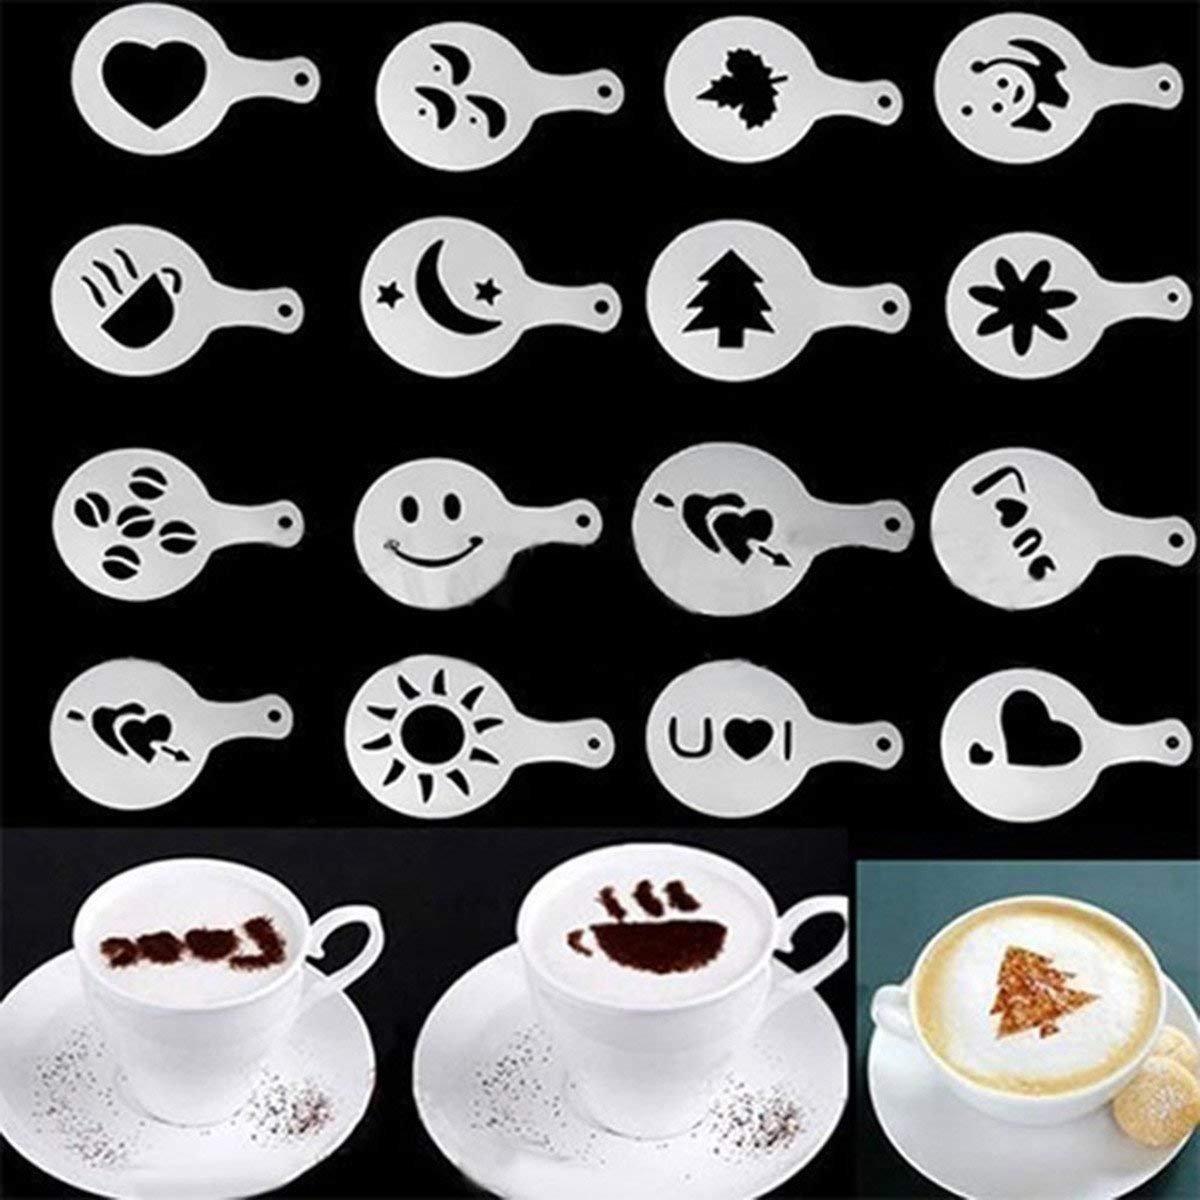 Ishua 16pcs Cappuccino Coffee Stencils DIY for Household& Professional Coffee Stencils Duster Spray Tool Nicedeal BHBA287